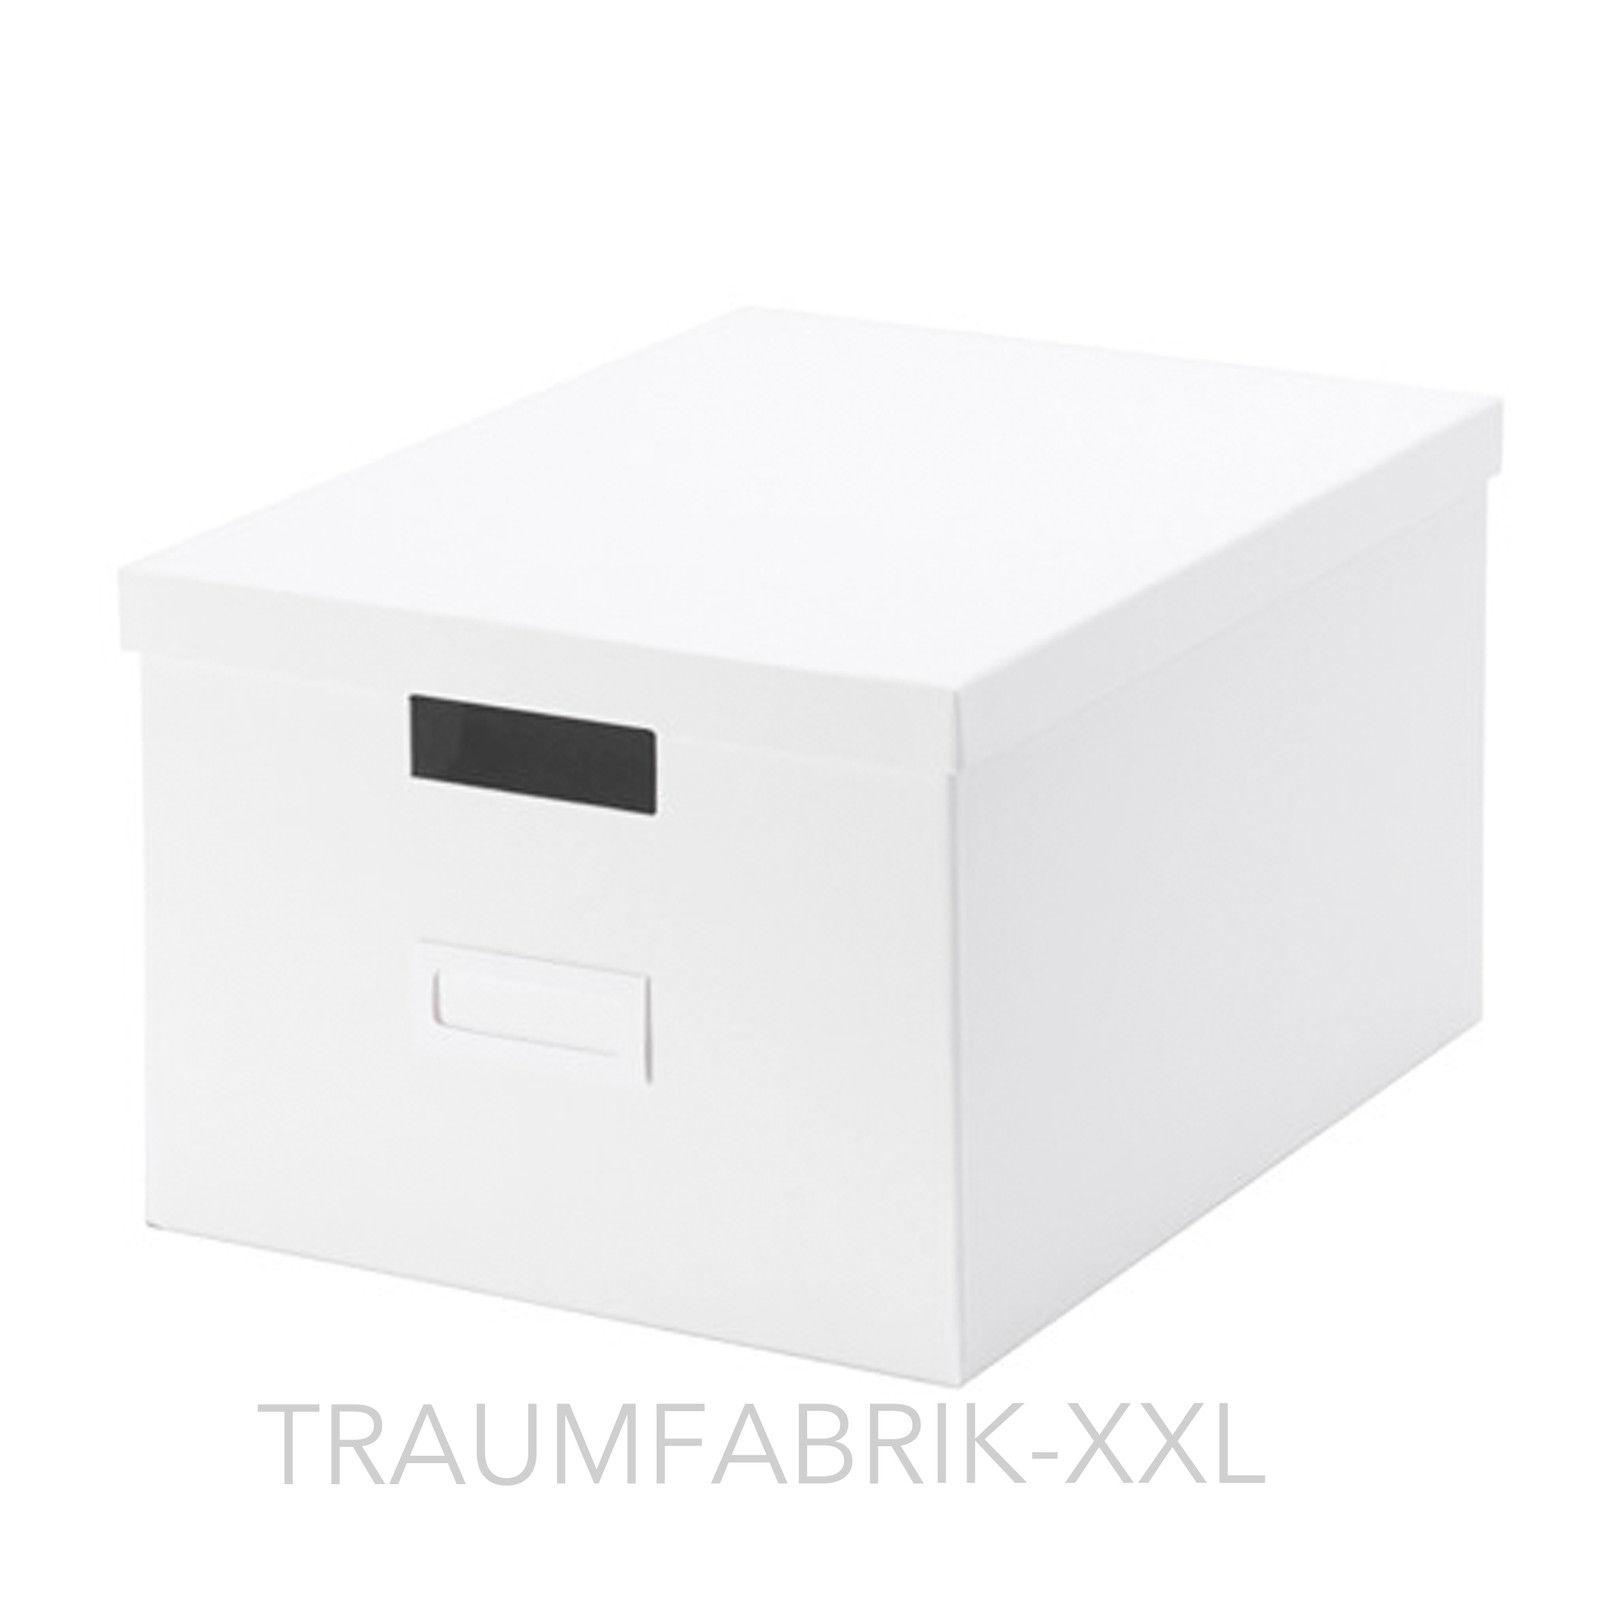 kiste mit deckel good eurobox lila deckel rollen xxcm lager kiste box stapelbox with kiste mit. Black Bedroom Furniture Sets. Home Design Ideas